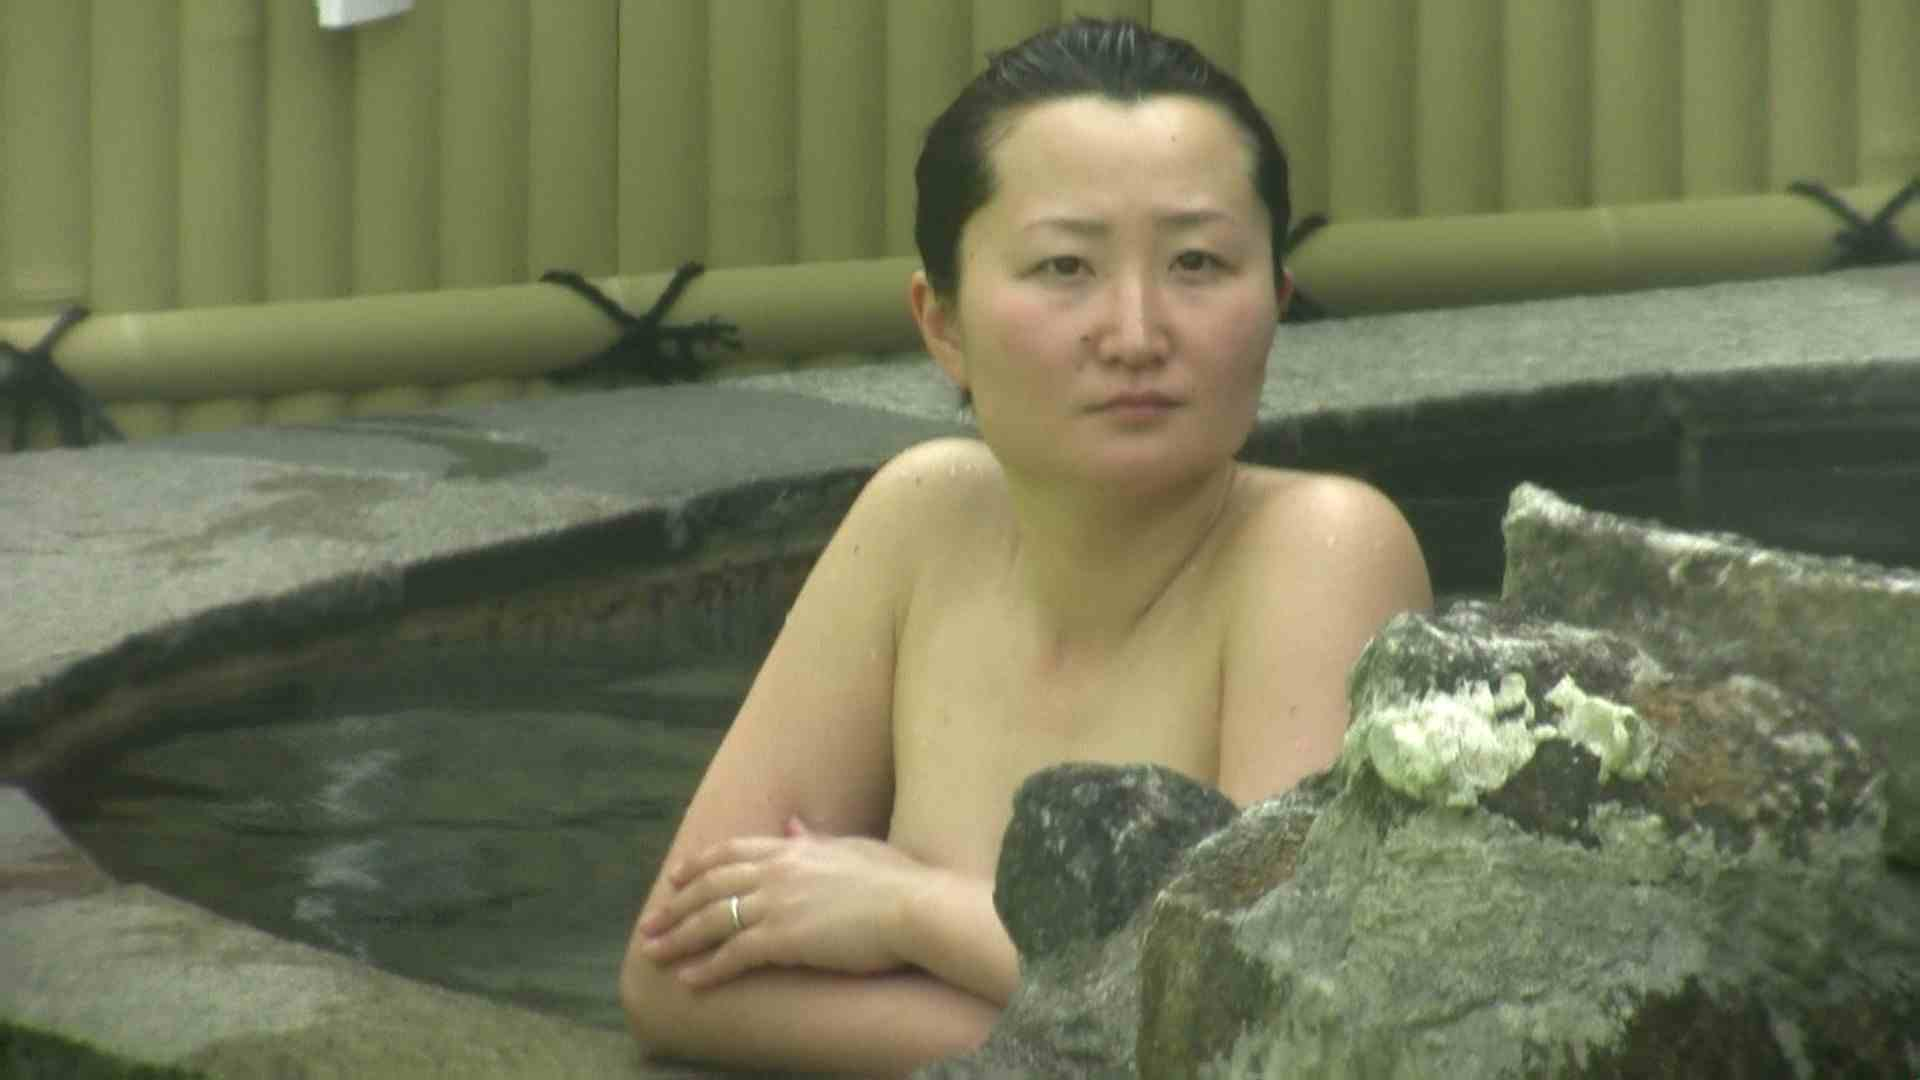 Aquaな露天風呂Vol.632 盗撮 | OLセックス  70画像 52